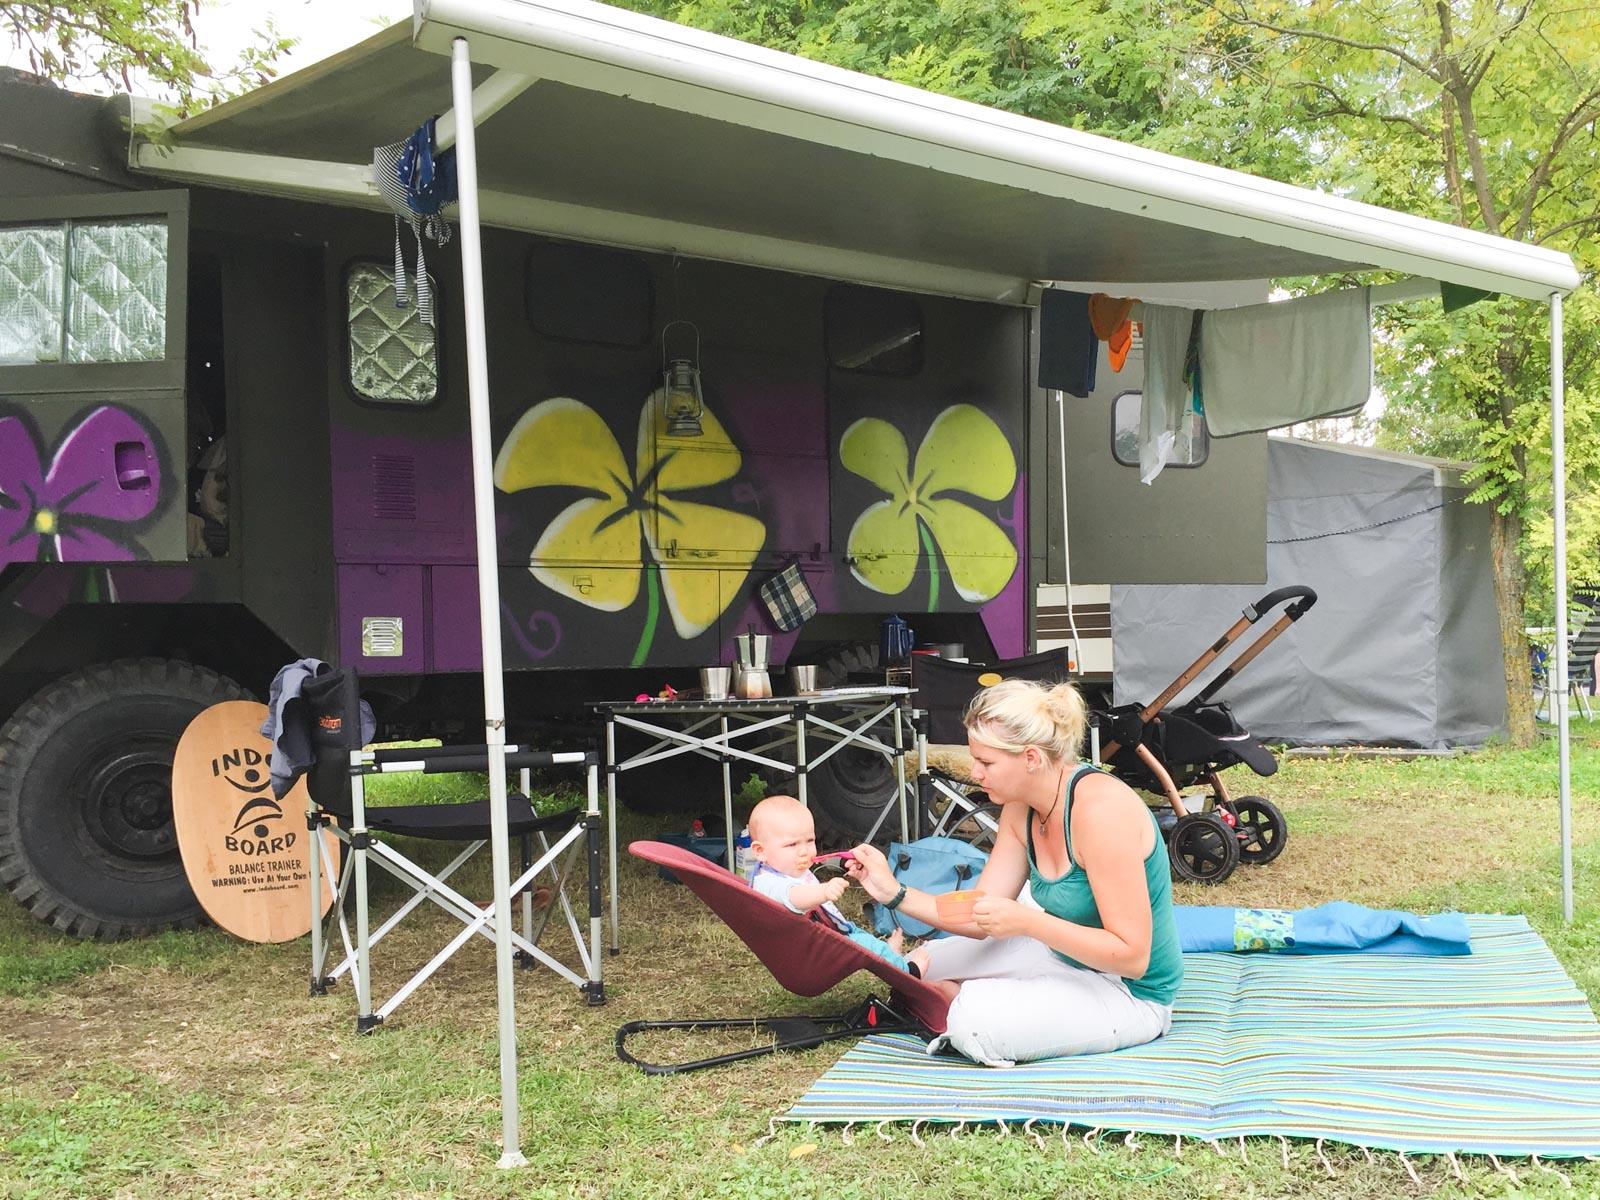 Outdoorküche Camping Ungaran : Hochzeitsreise zu dritt: mit dem baby durch europa matsch&piste